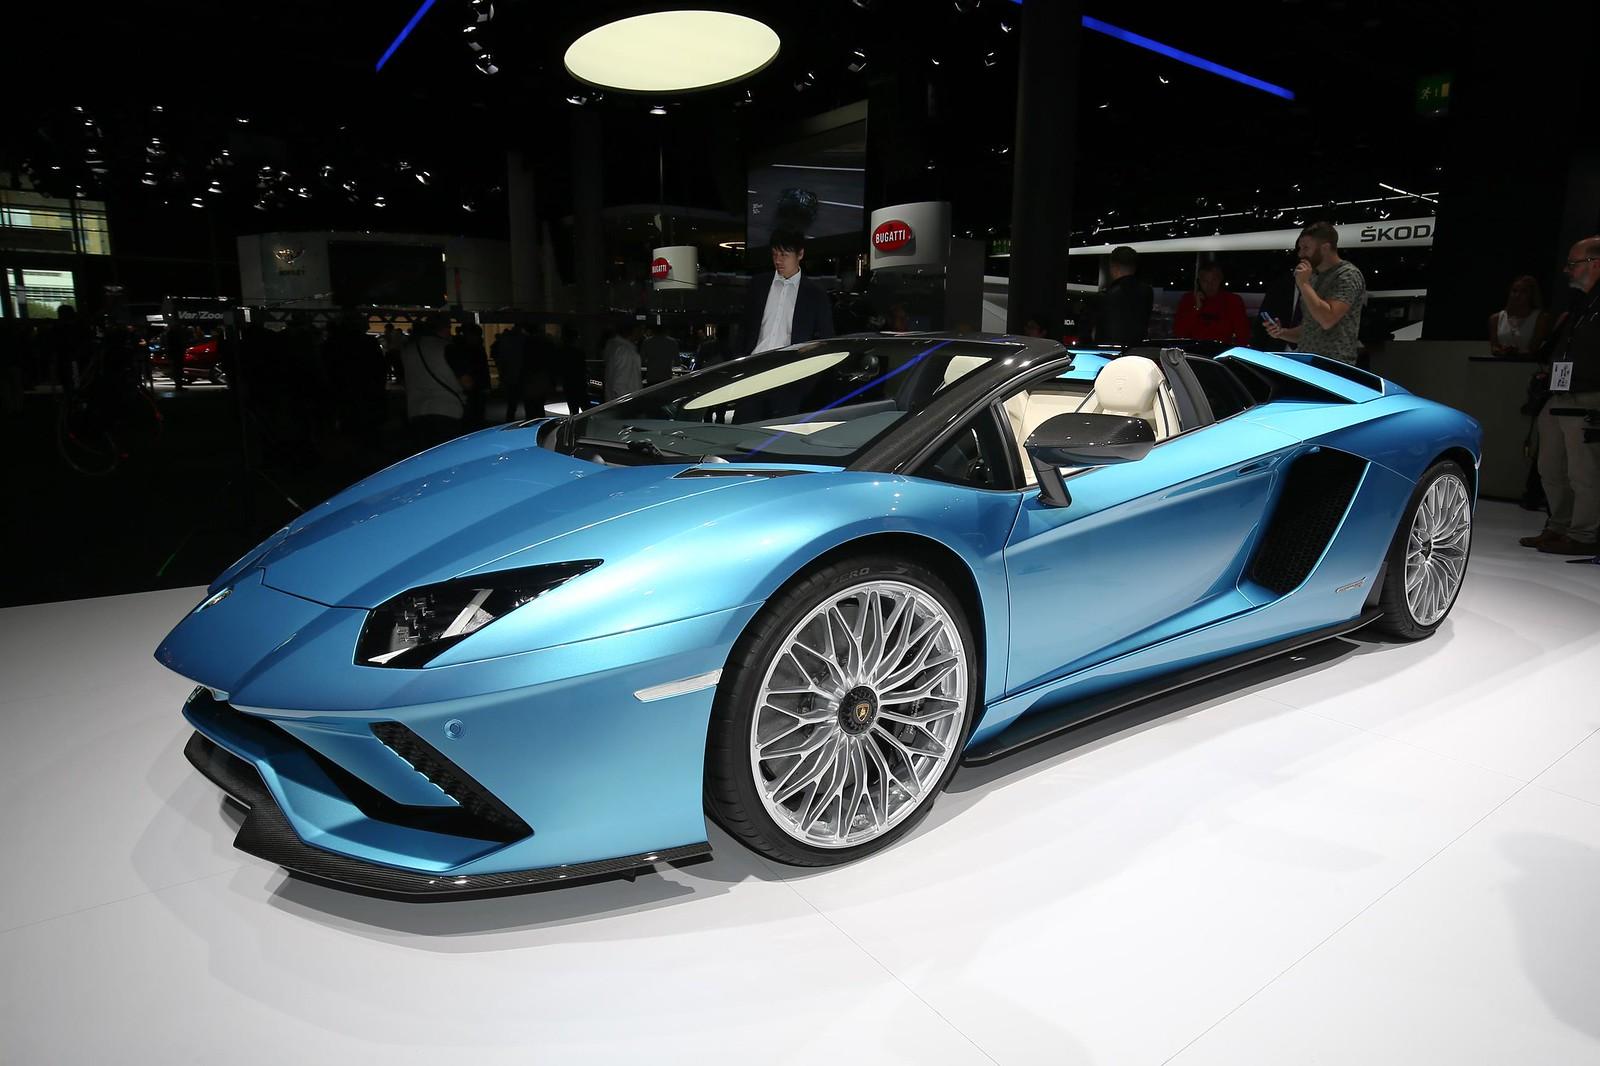 Lamborghini Aventador S Roadster live photos: 2017 Frankfurt Auto Show